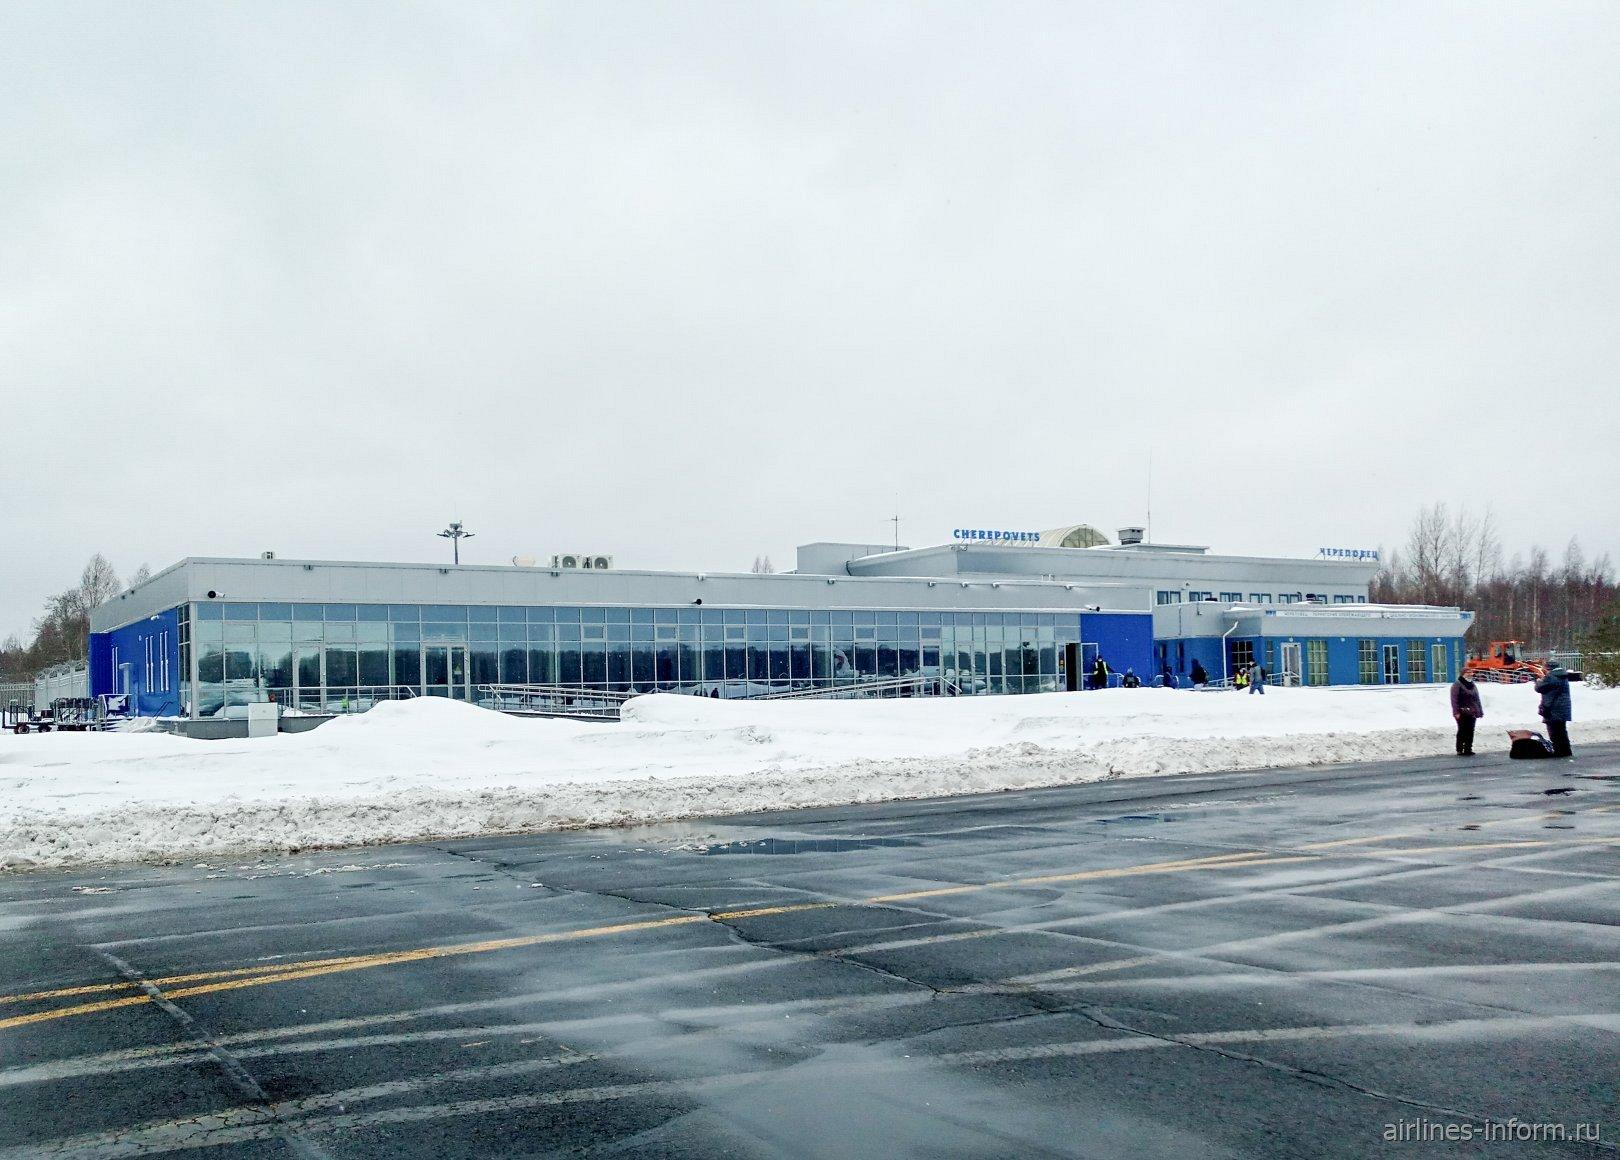 Вид с перрона на пассажирский терминал аэропорта Череповец